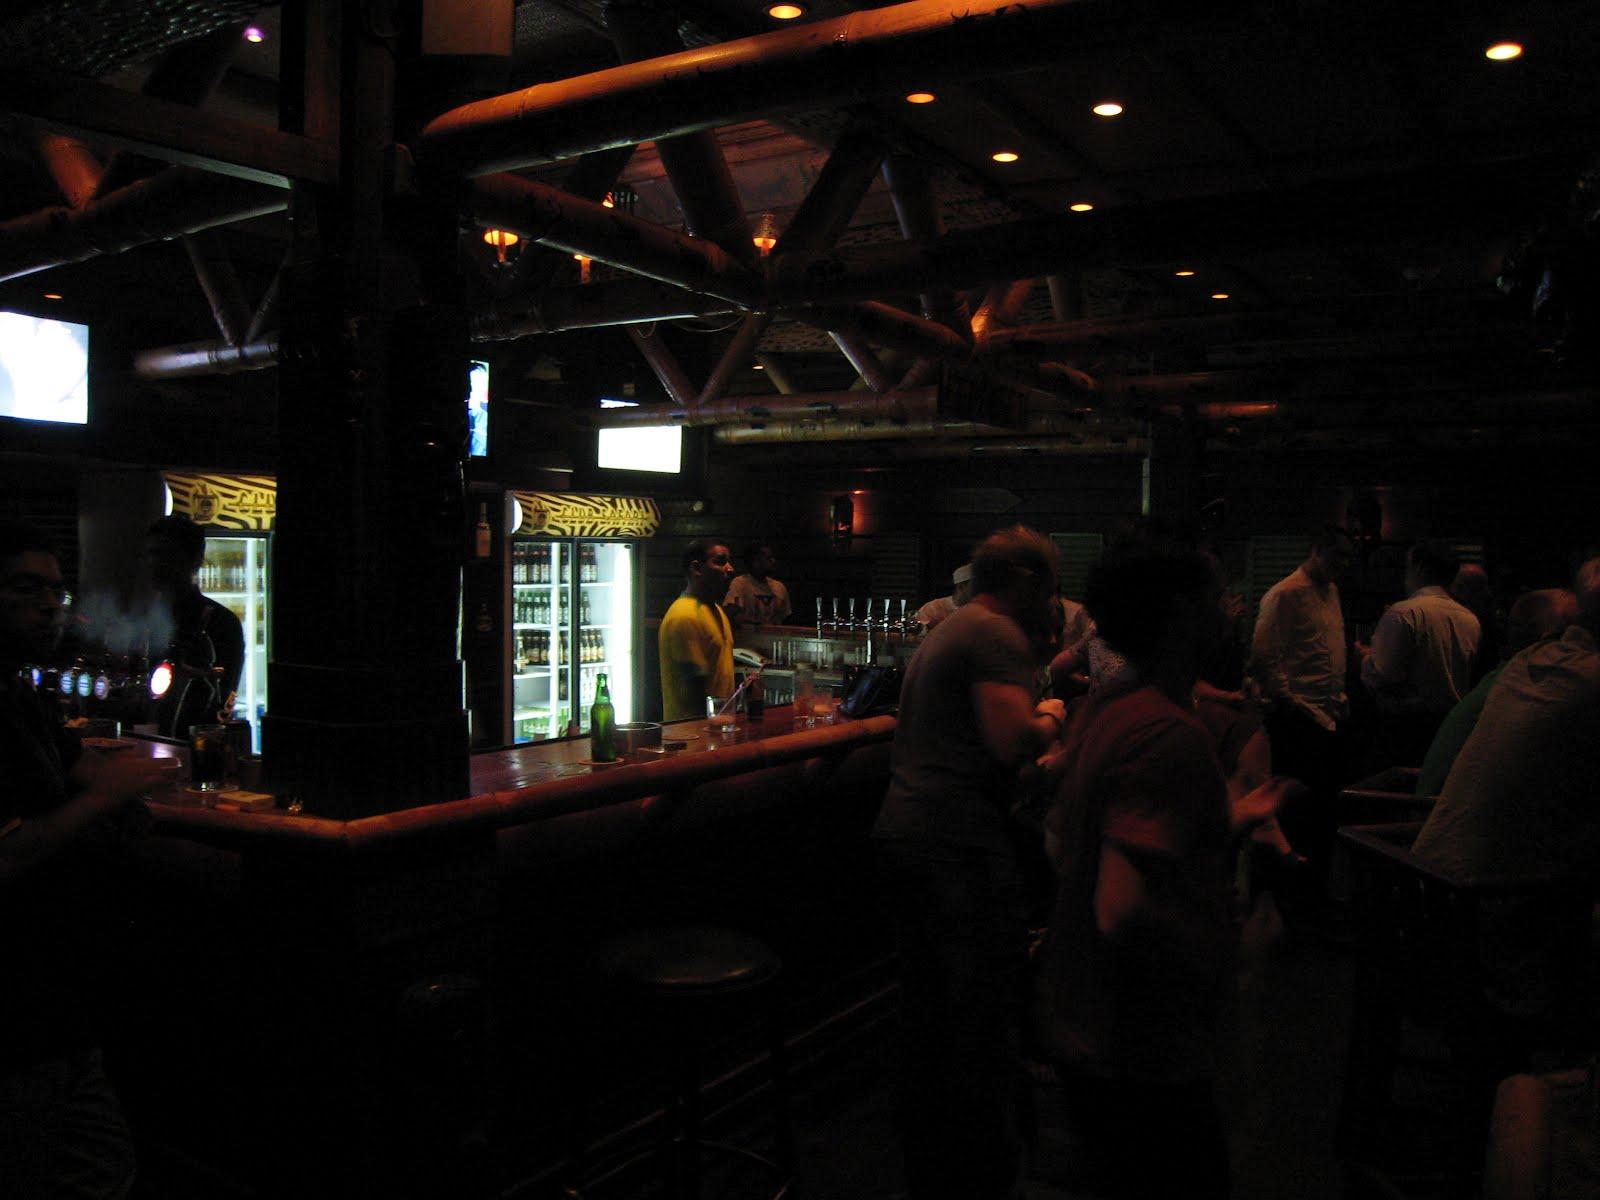 Oman expat: Safari pub in Hyatt